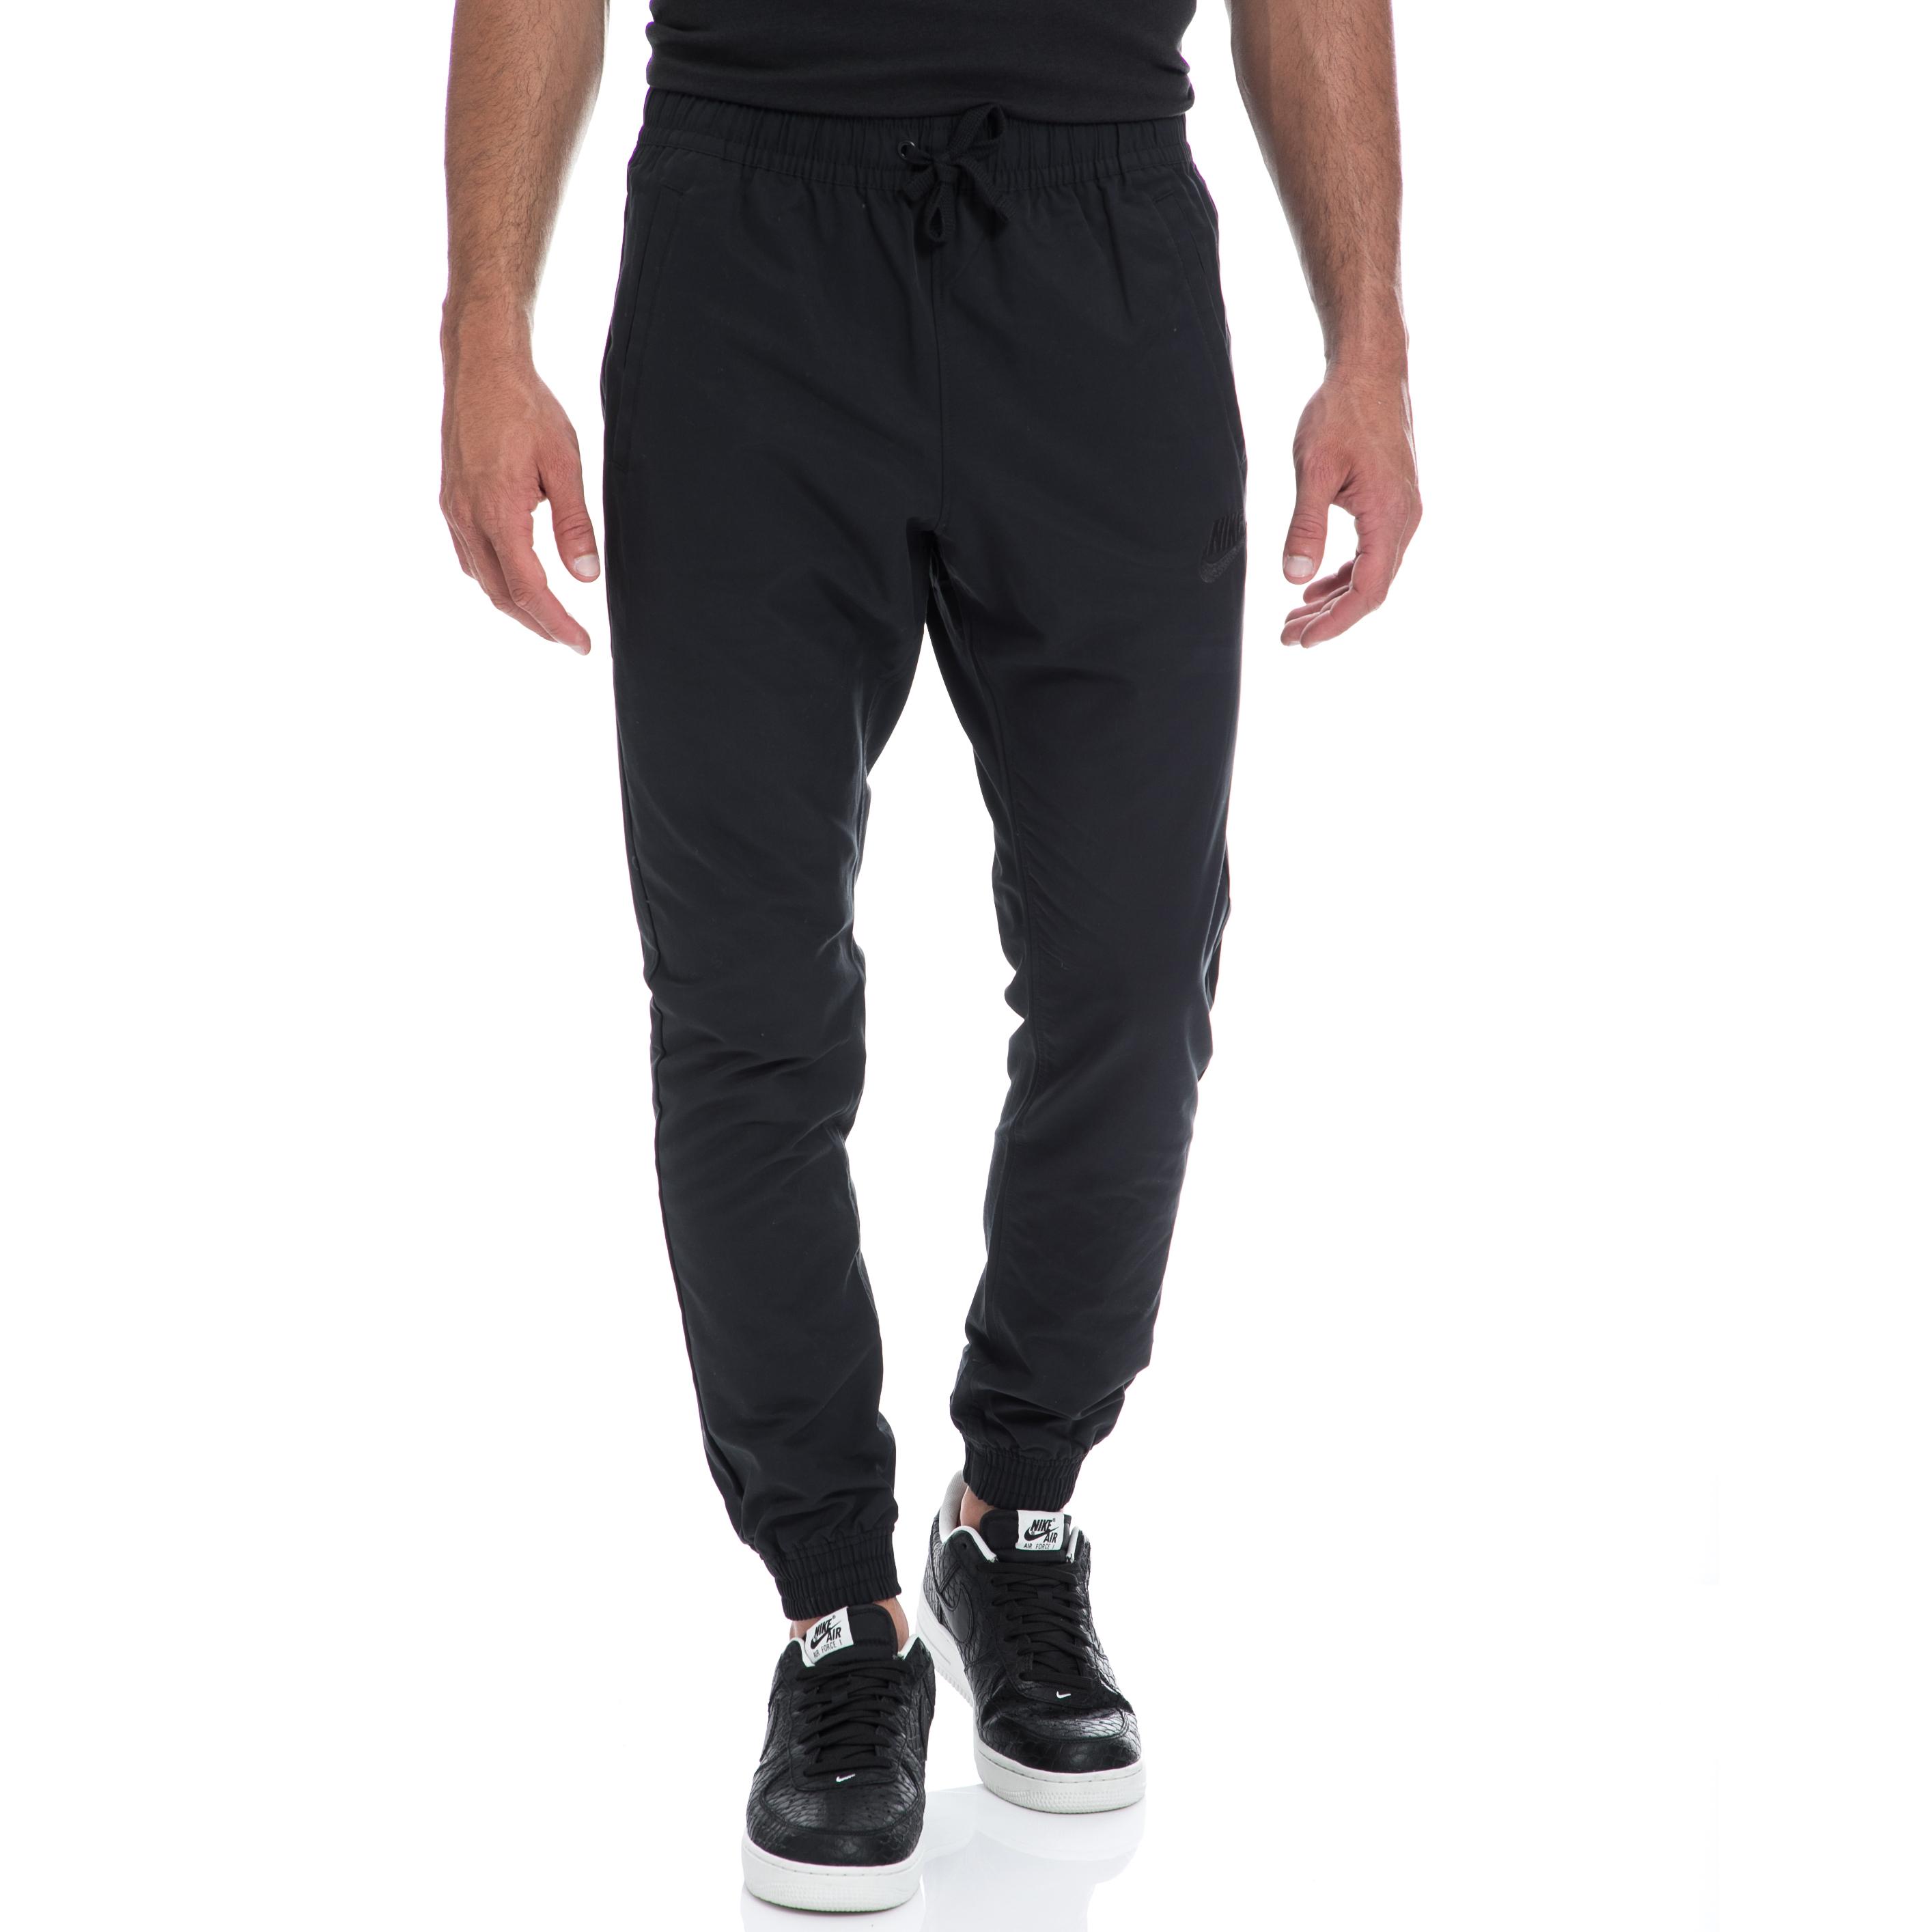 NIKE - Αντρική φόρμα NIKE μαύρη ανδρικά ρούχα αθλητικά φόρμες